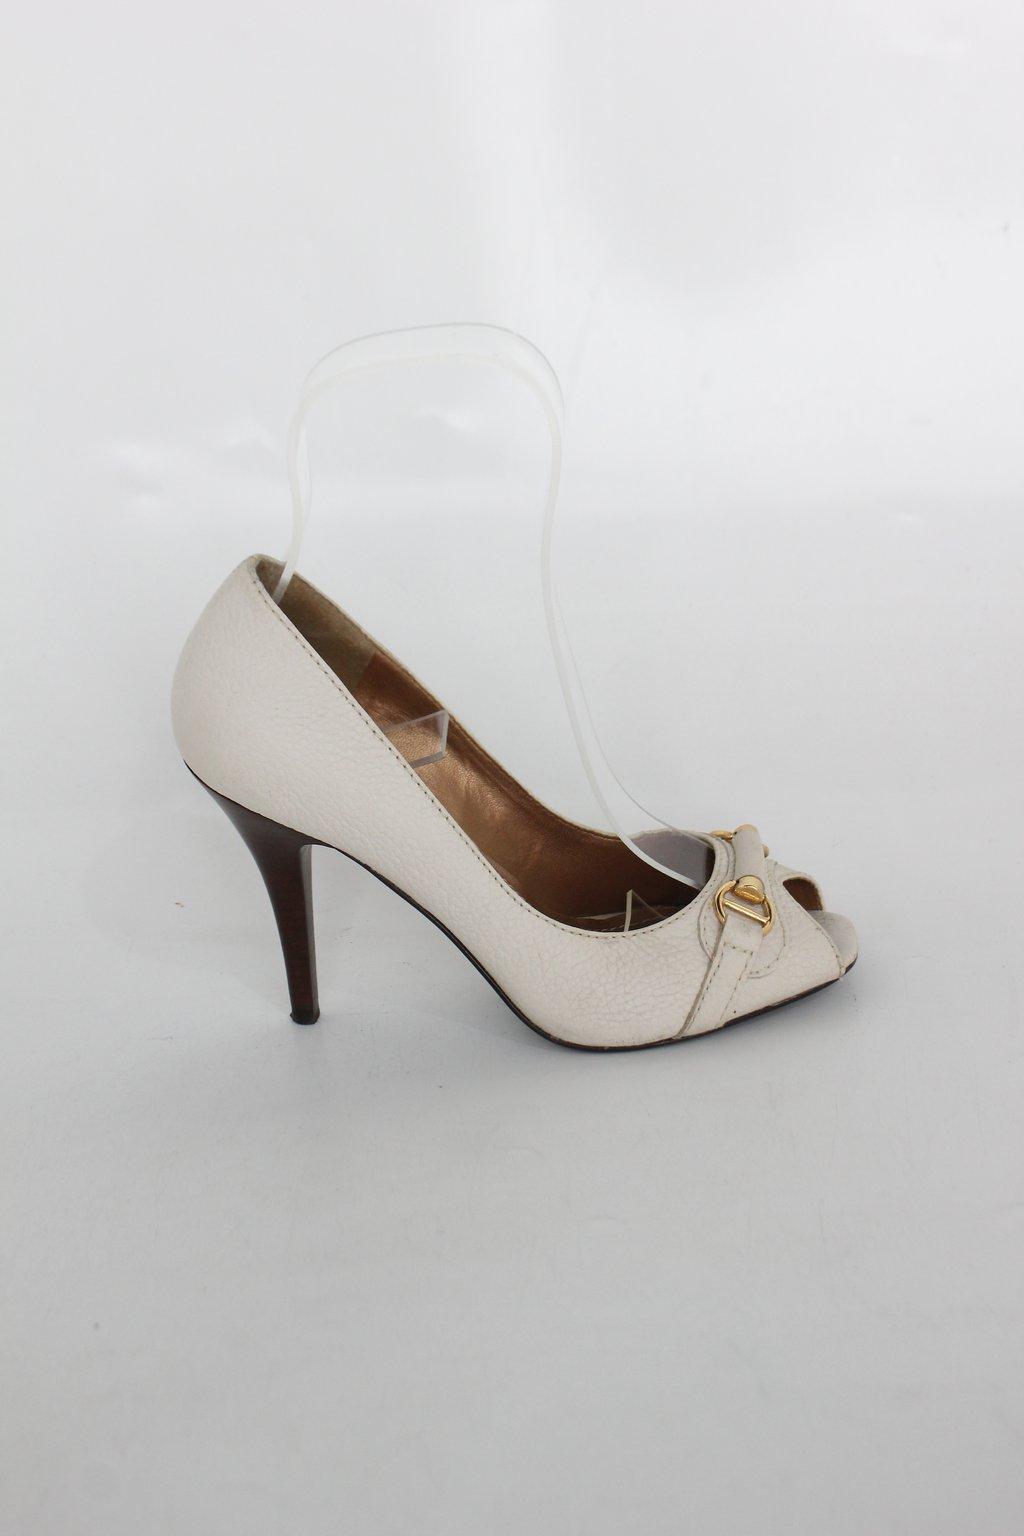 Sapato Peep Toe Jaet Set Feminina Bege Com Fivela